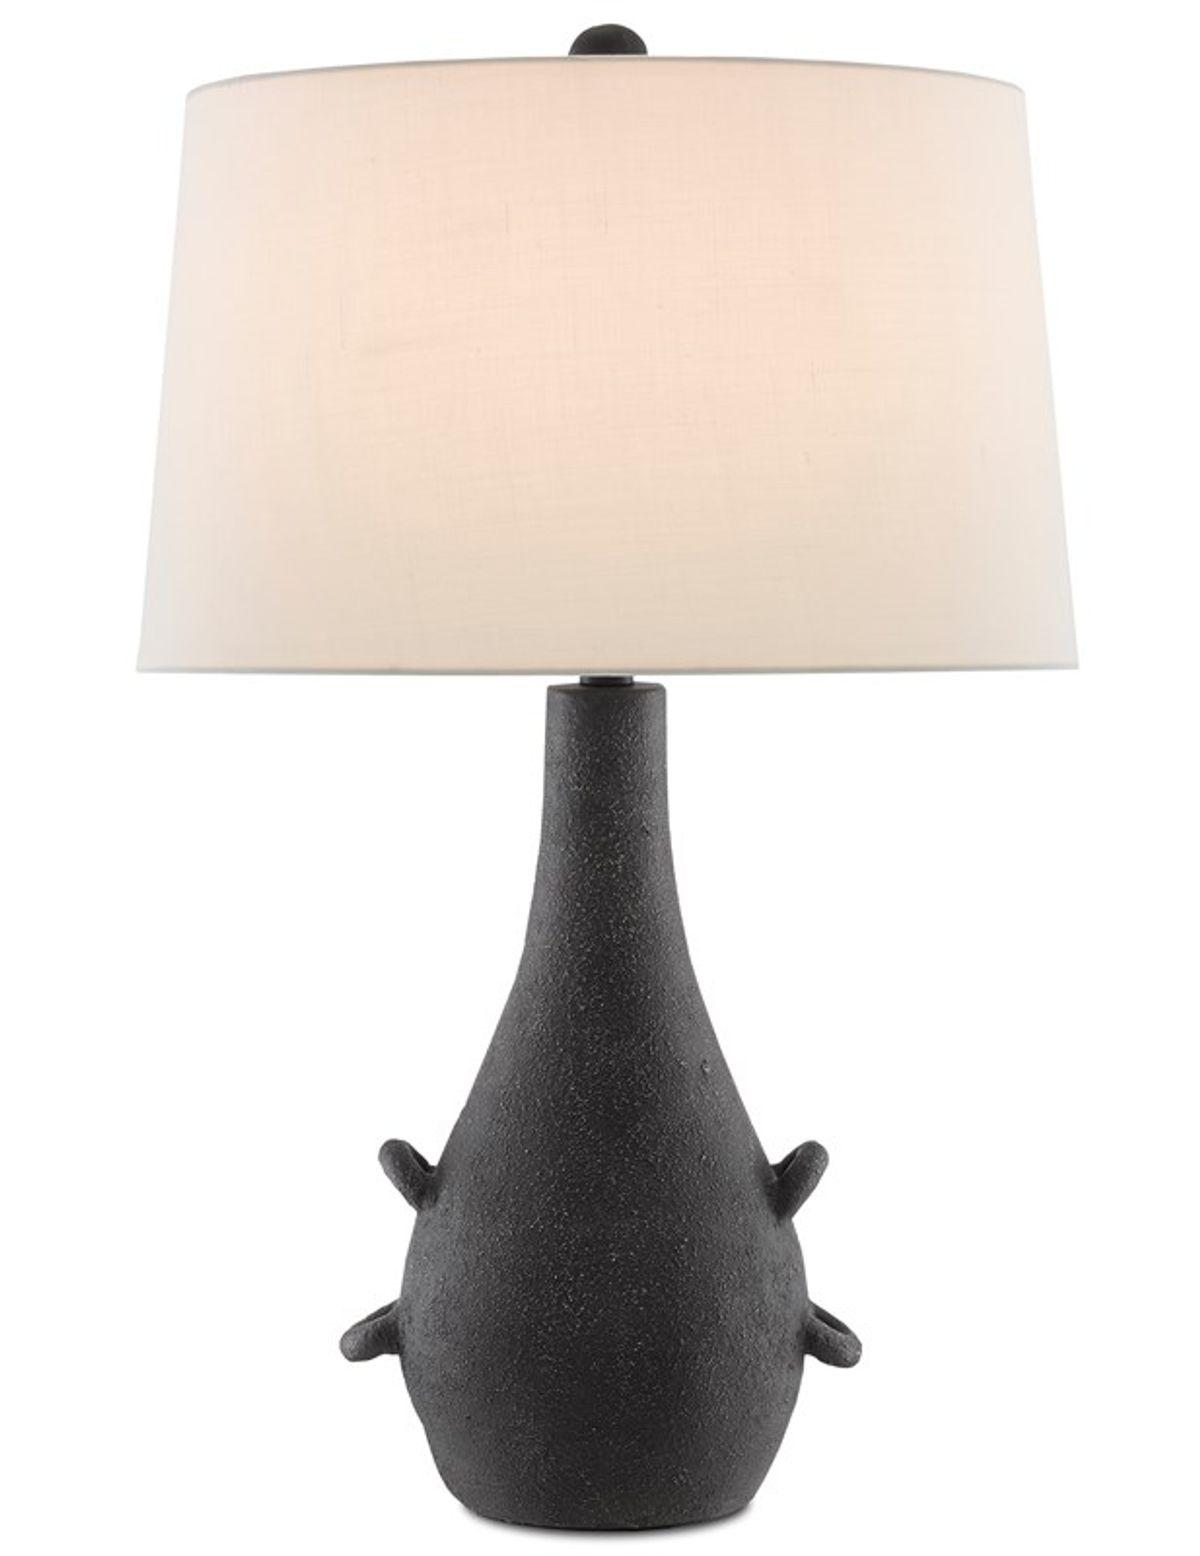 Teramo Table Lamp